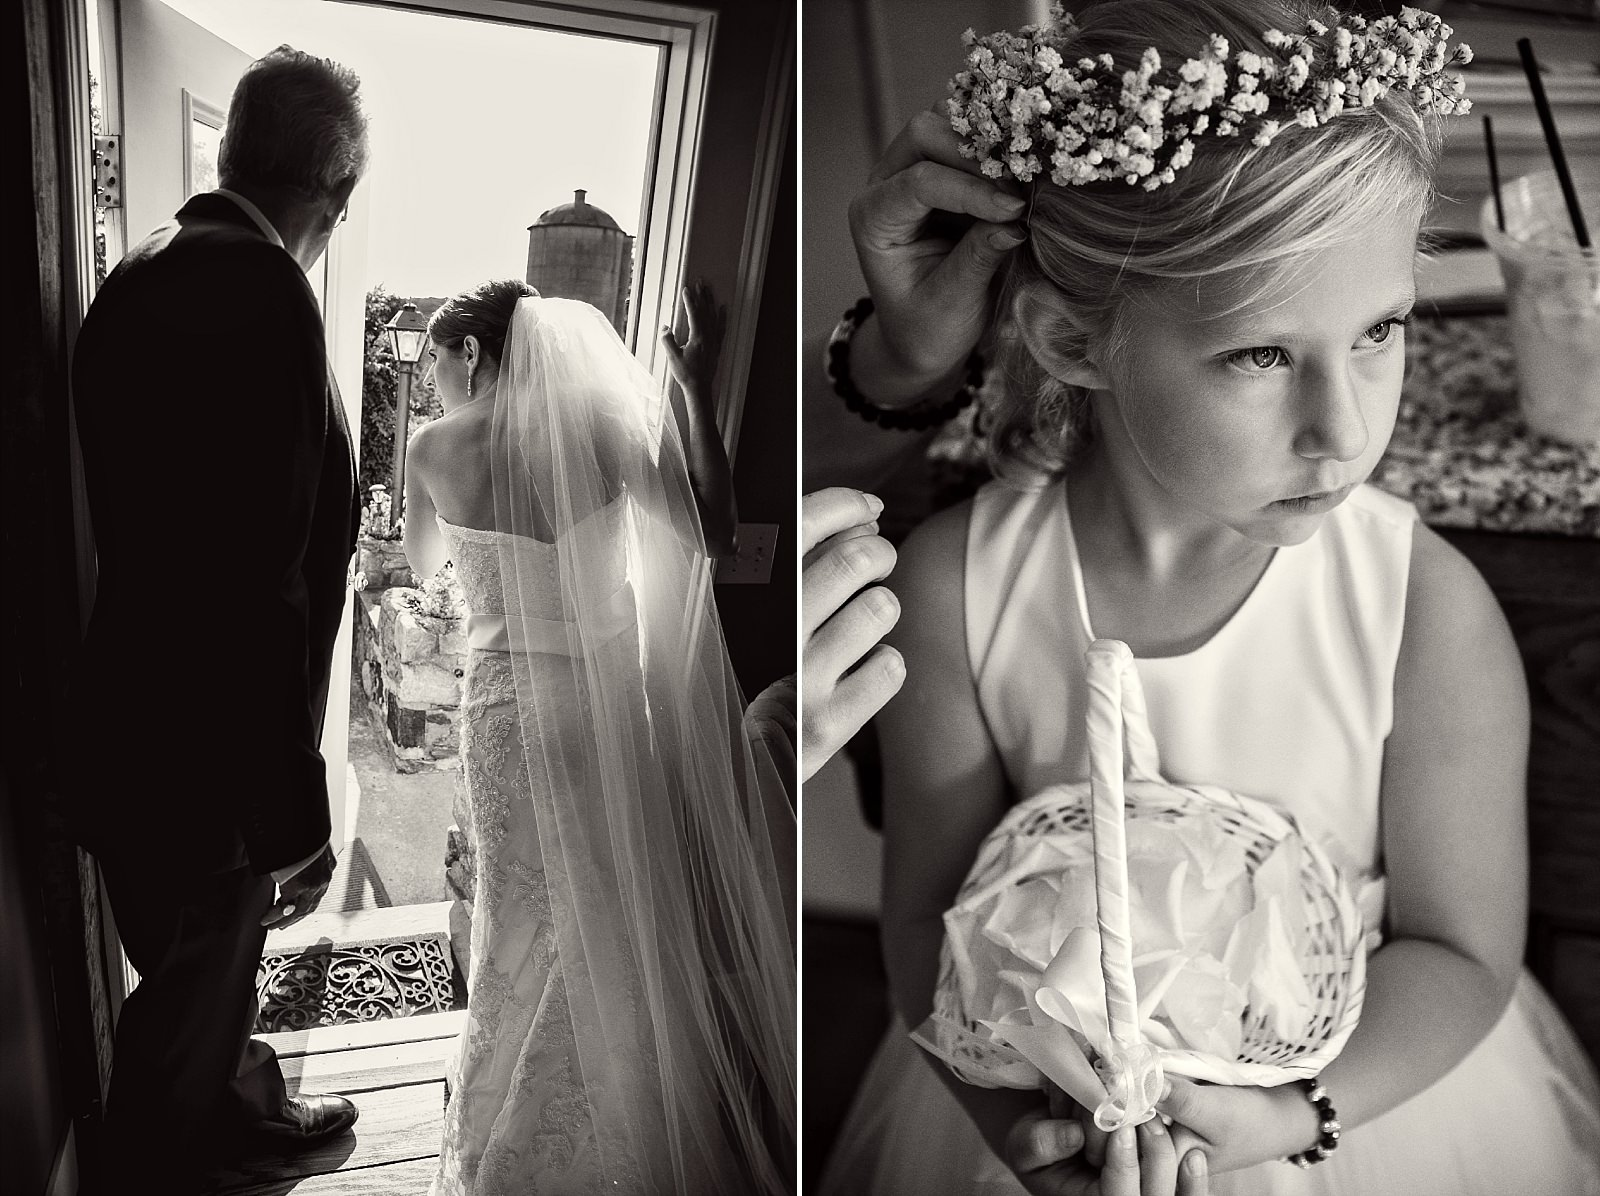 CT_Wedding_Photographer_LiNa_Wed_34.jpg